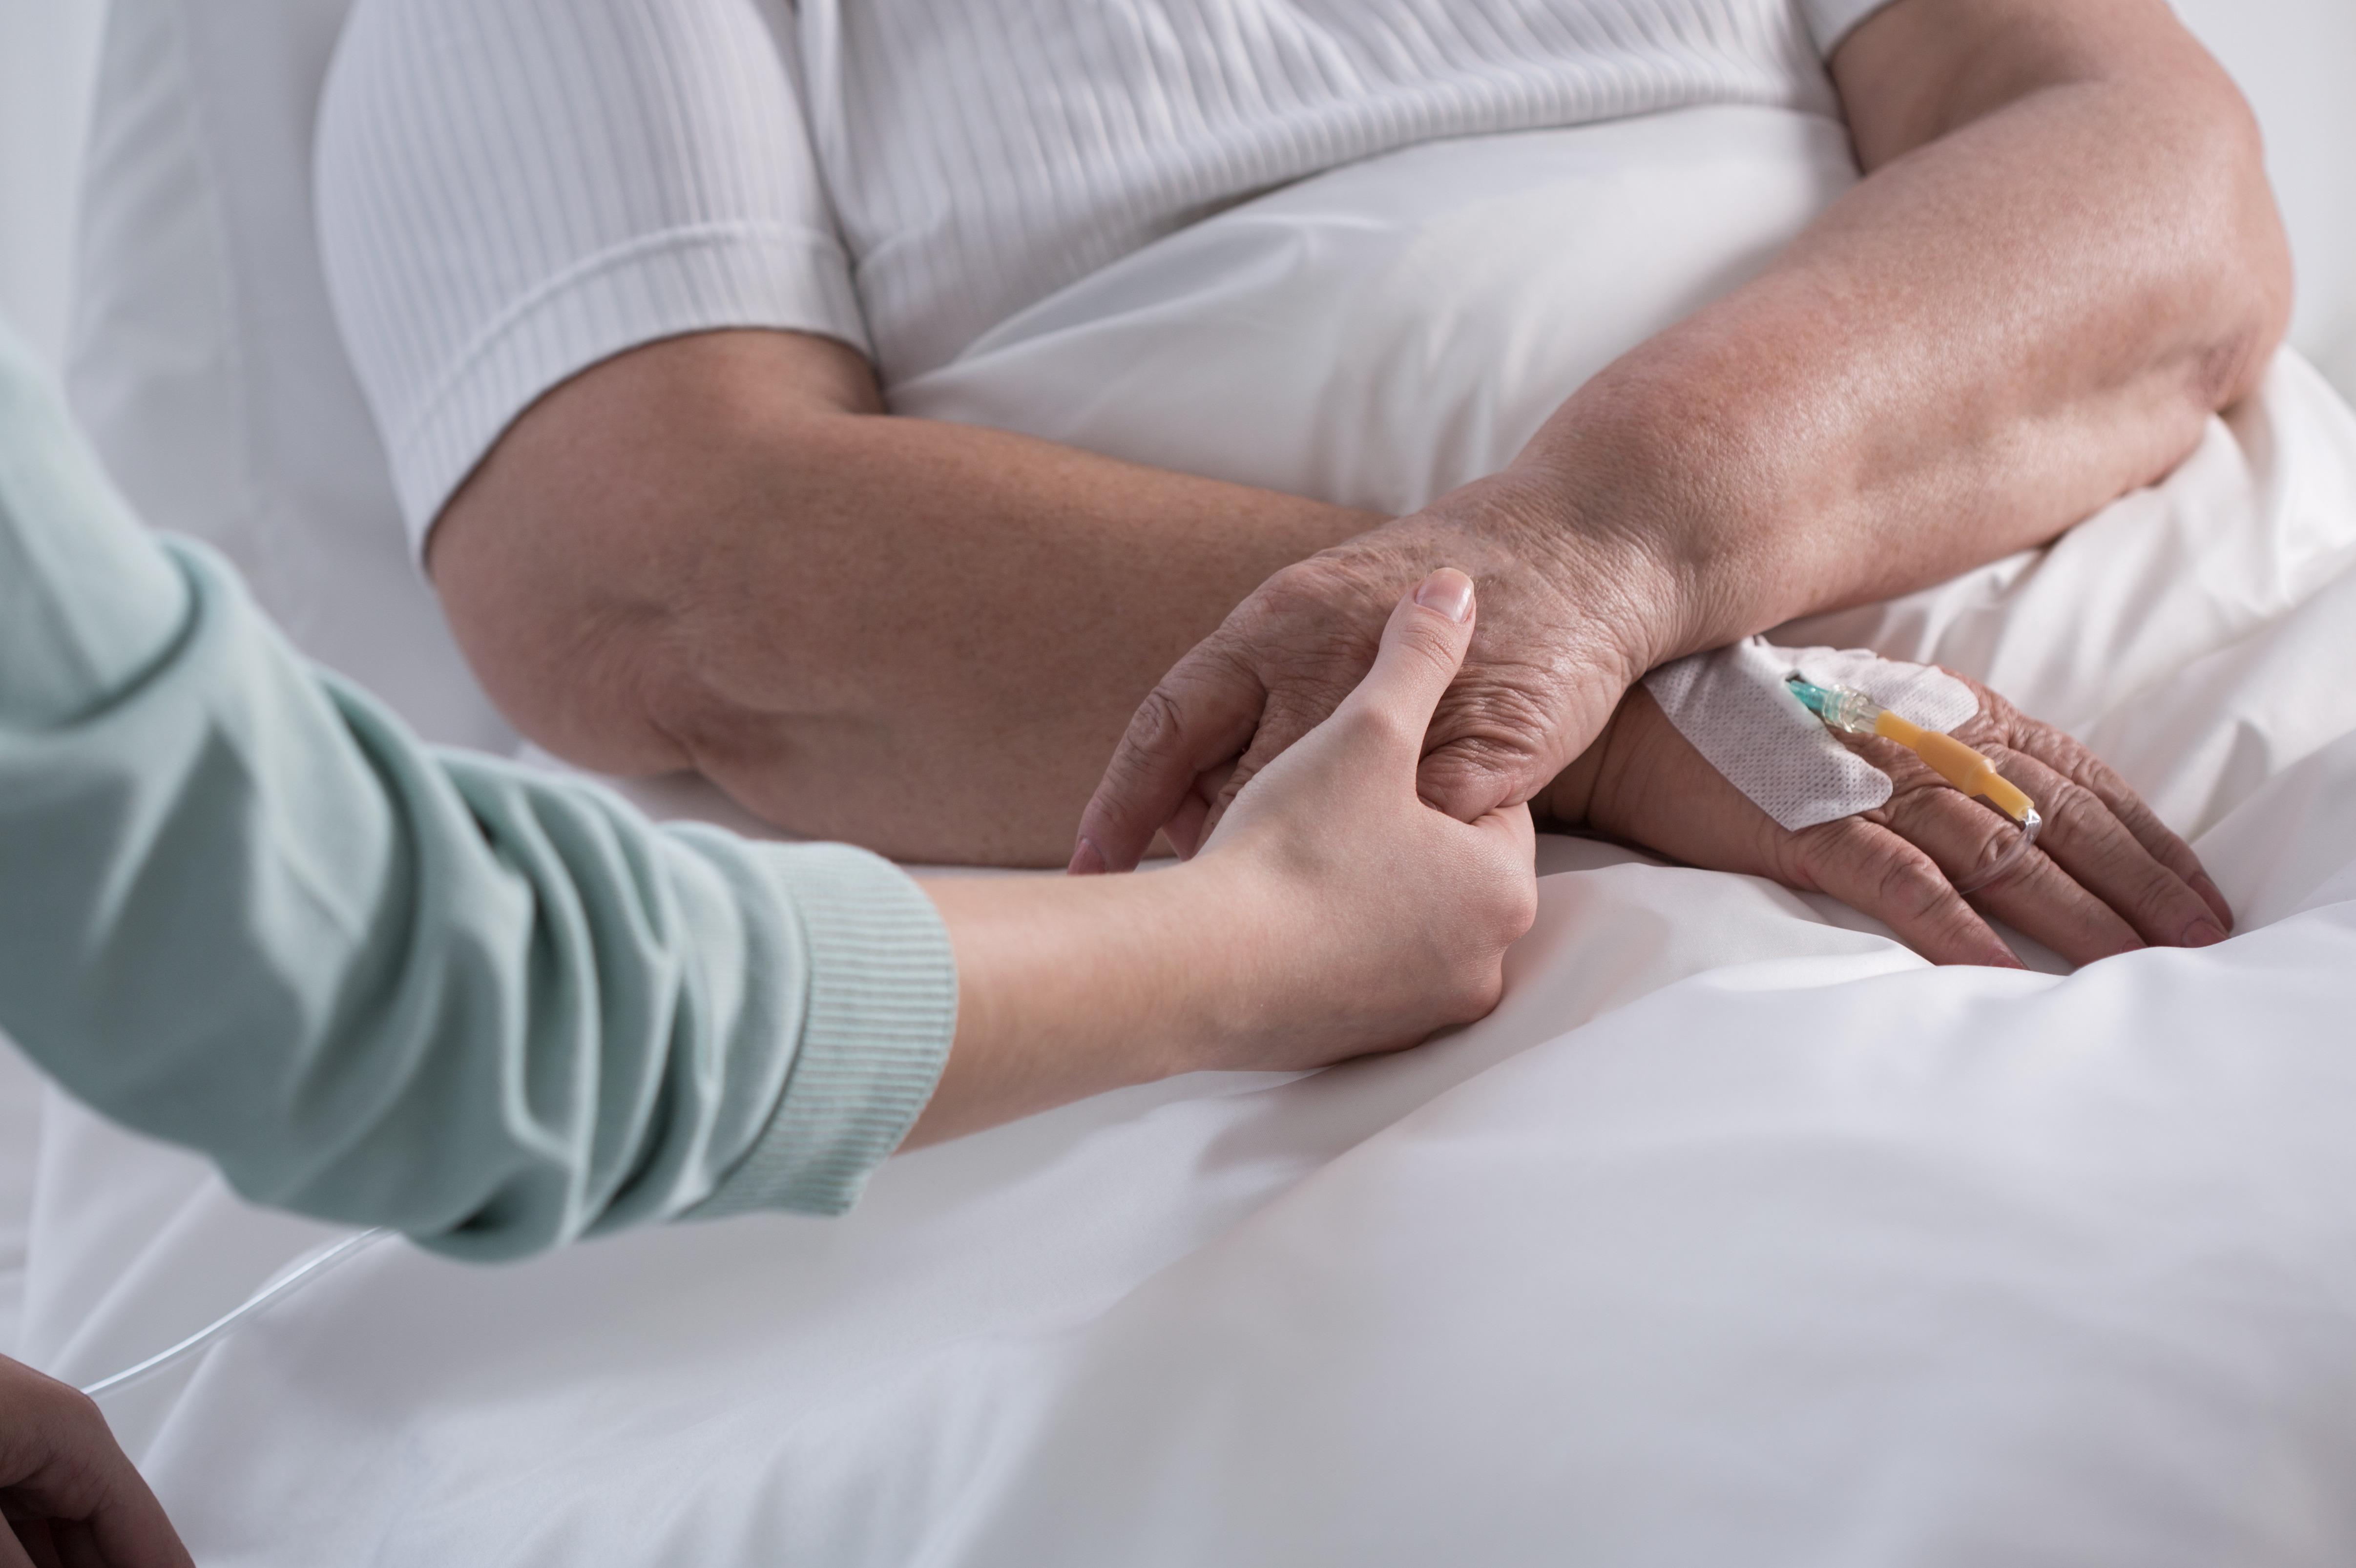 Nurse comforts palliative care patient